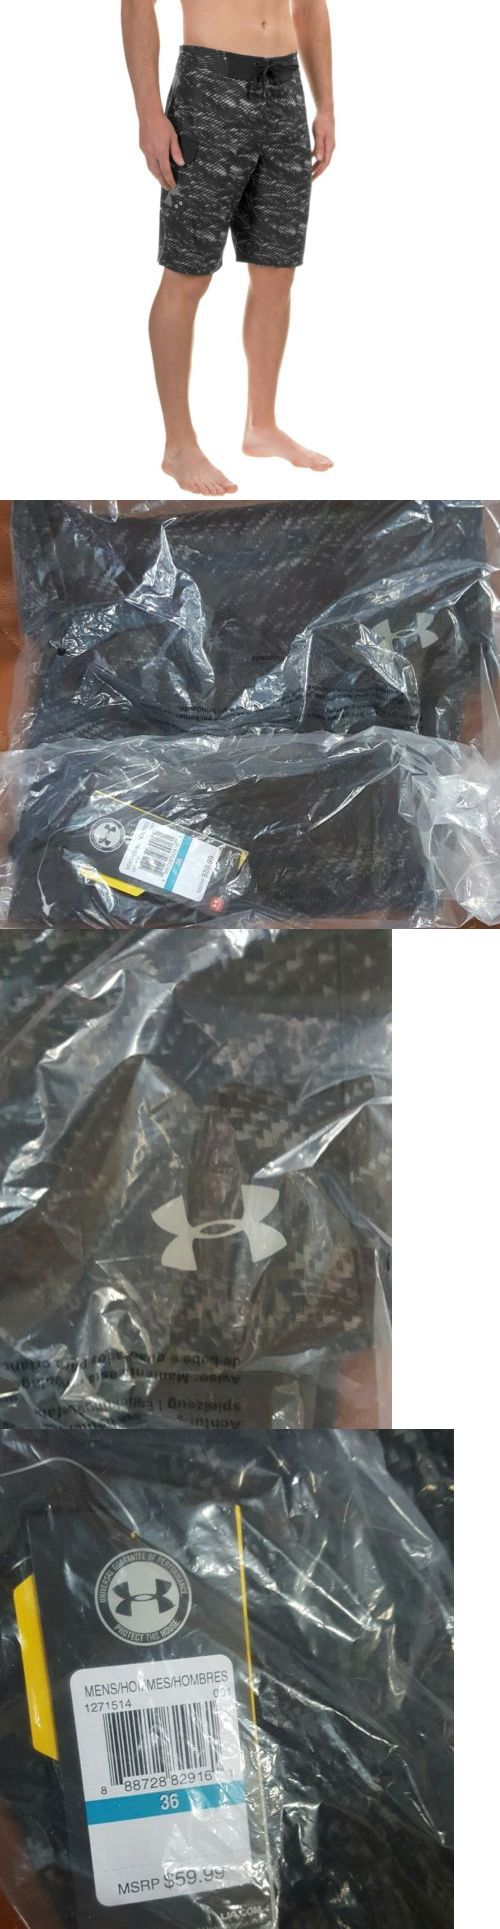 Men 140041: Under Armour Mens Reblek Boardshorts Board Short Swim Trunks Granite Camo Nwt BUY IT NOW ONLY: $38.0